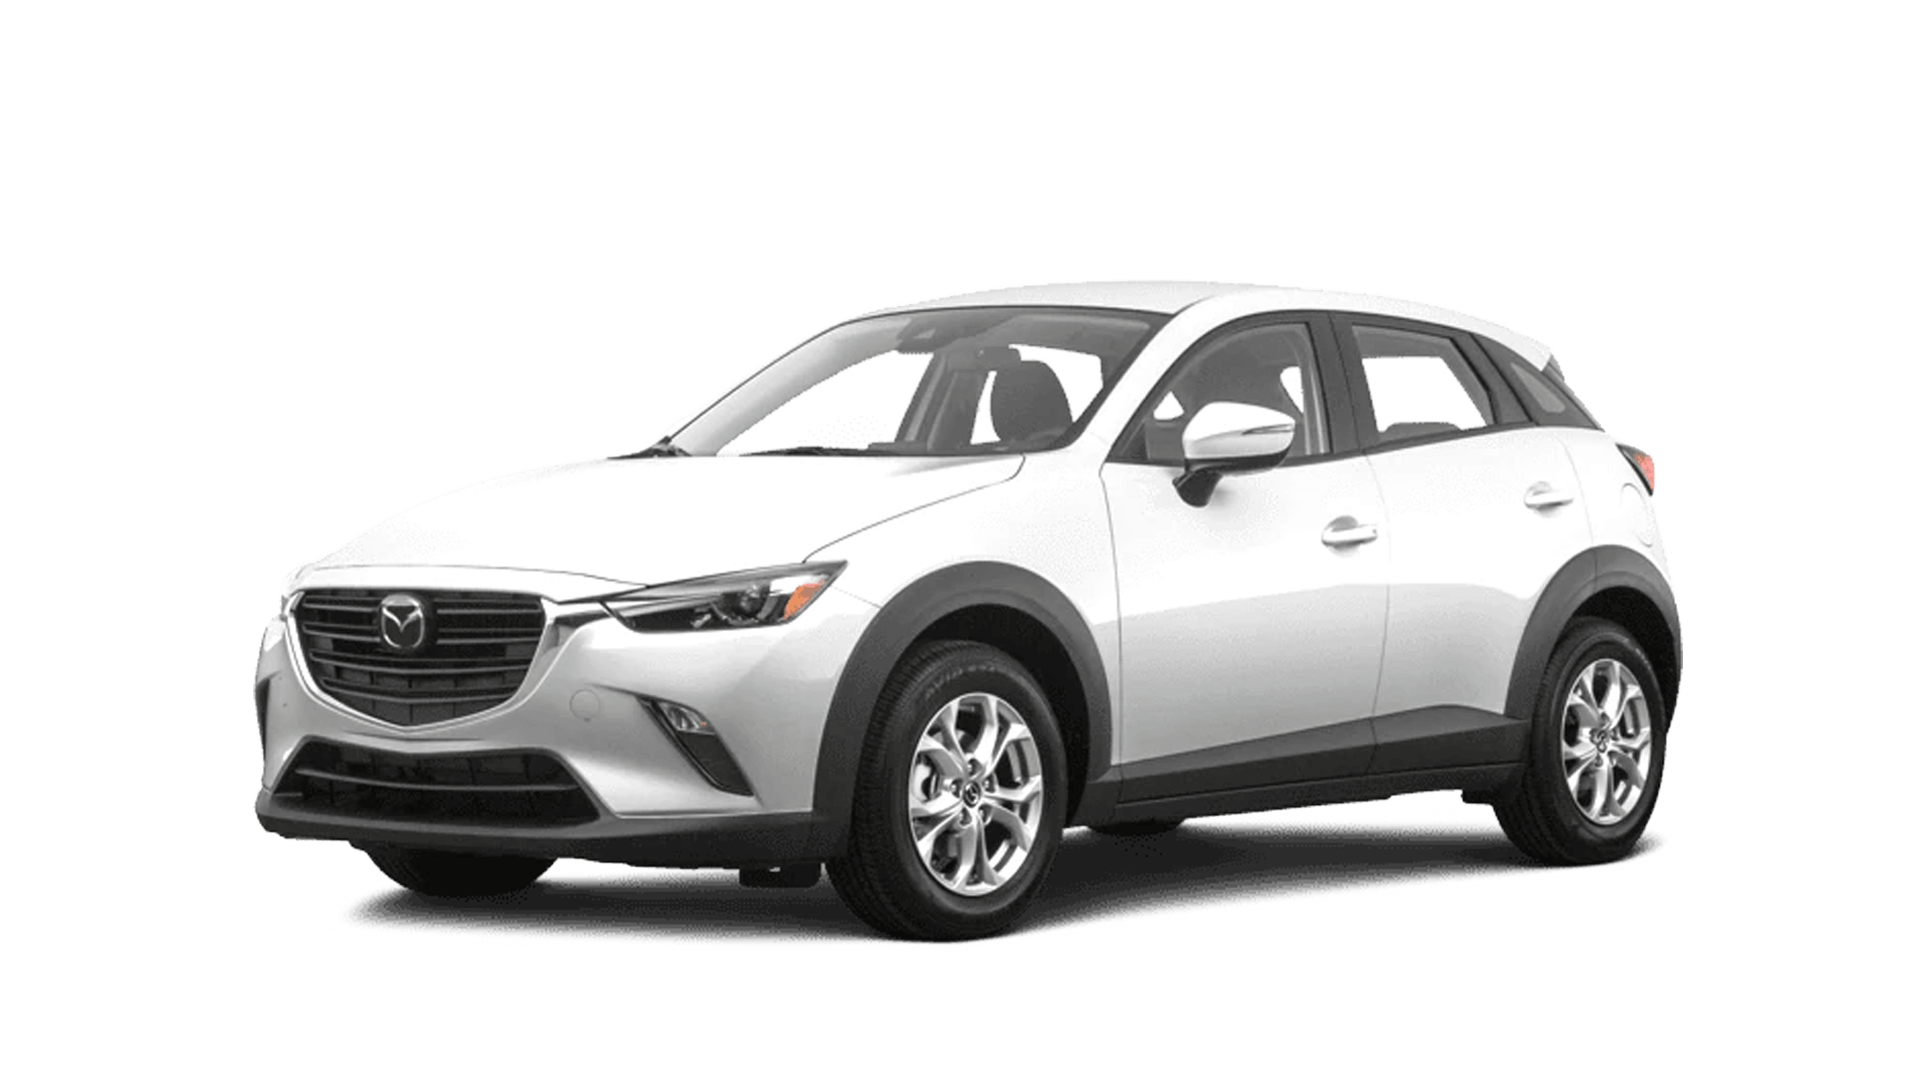 ekar - Mazda CX-3